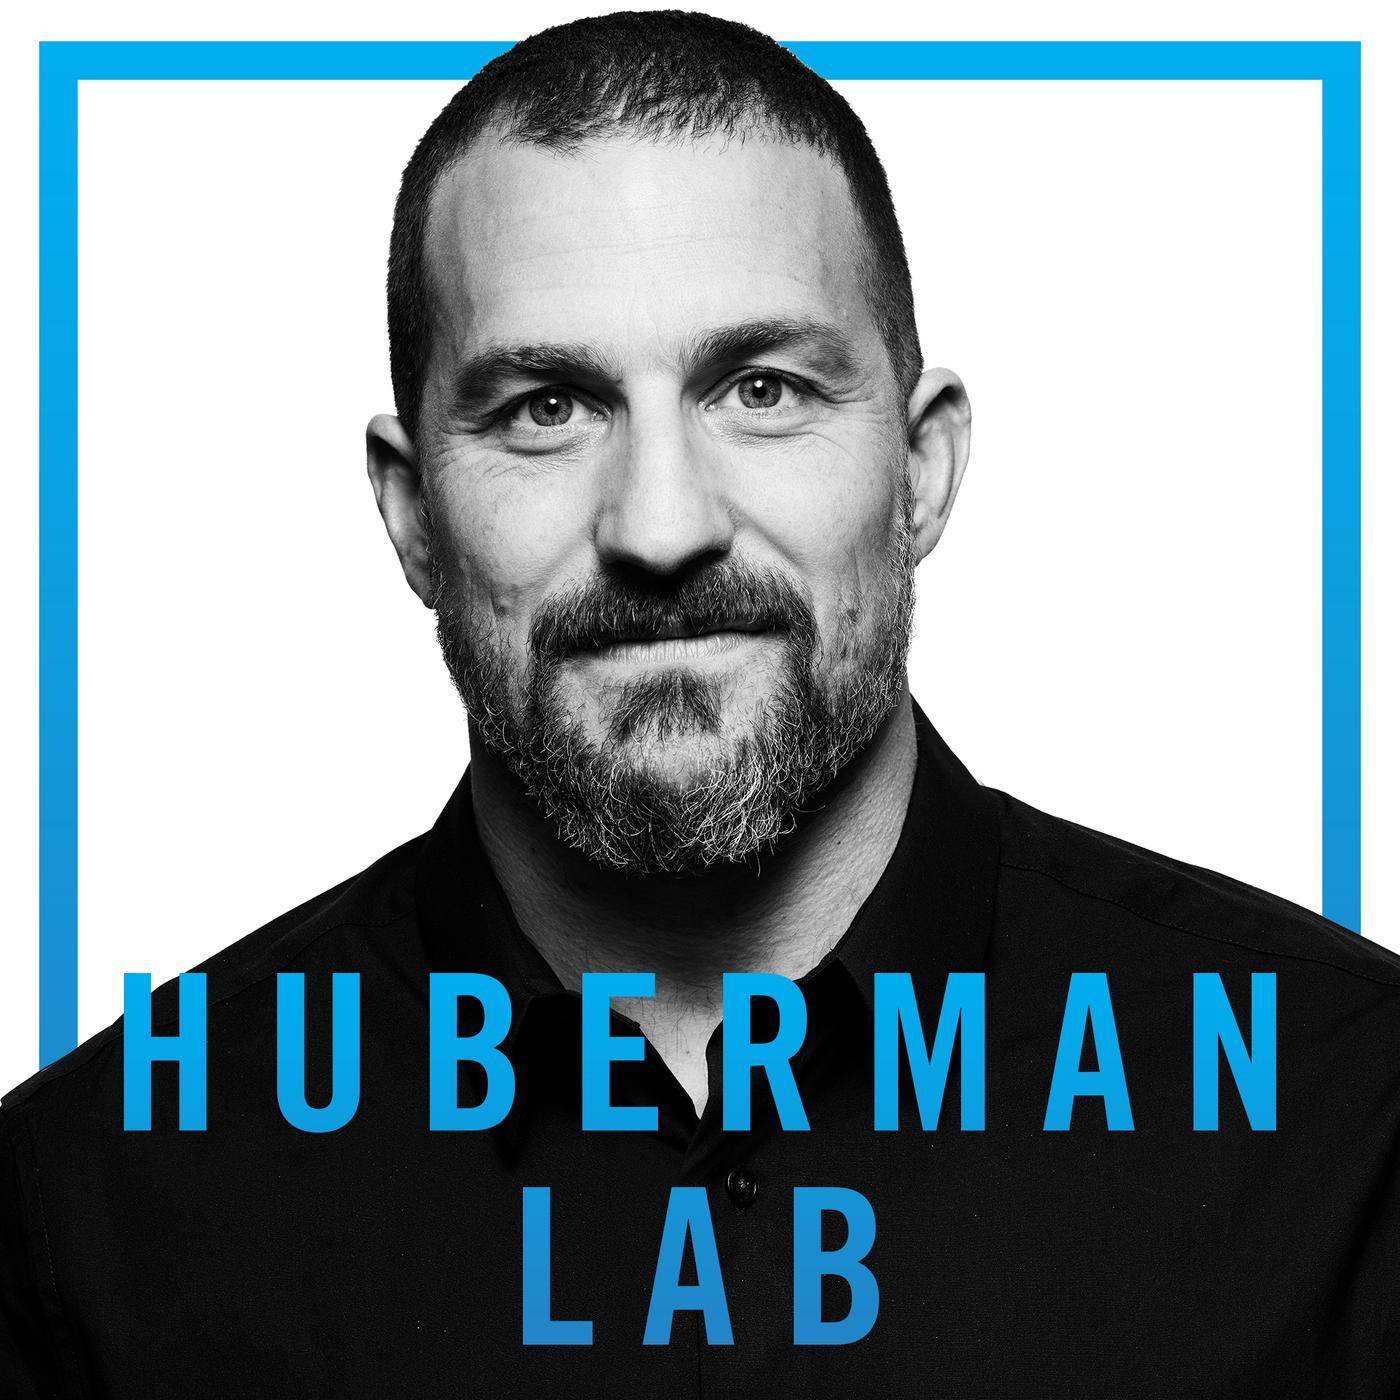 Huberman Lab (podcast) - Dr. Andrew Huberman | Listen Notes